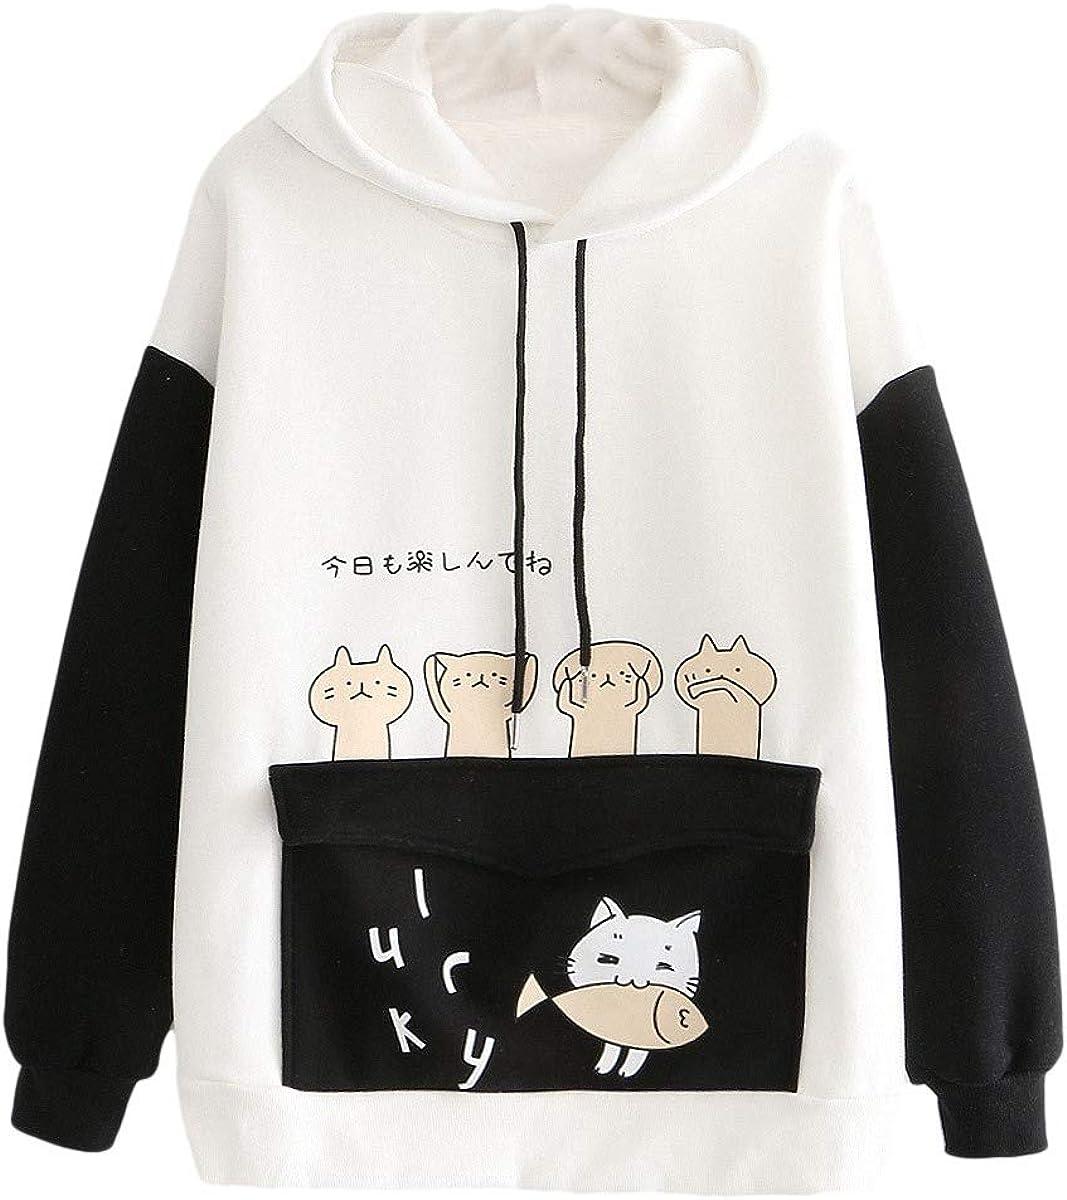 ONHUON Cute Hoodies for Women,Womens Long Sleeve Splice Sweatshirt Tops Cartoon Cute Hoodies Teens Girls Casual Pullover